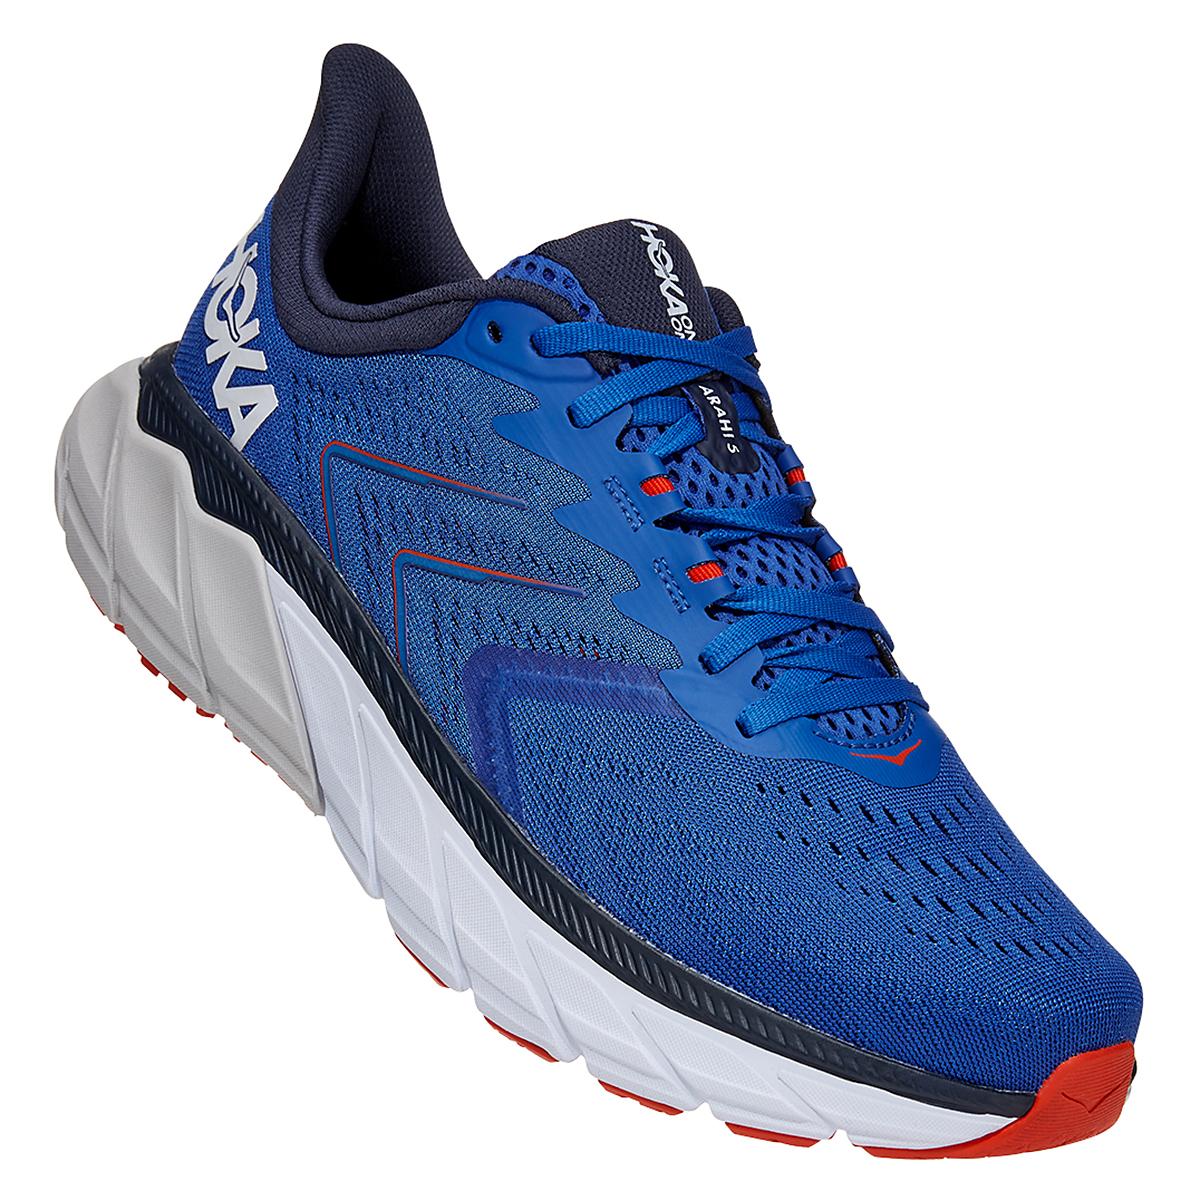 Men's Hoka One One Arahi 5 Running Shoe - Color: Turkish Sea/White - Size: 7 - Width: Regular, Turkish Sea/White, large, image 2